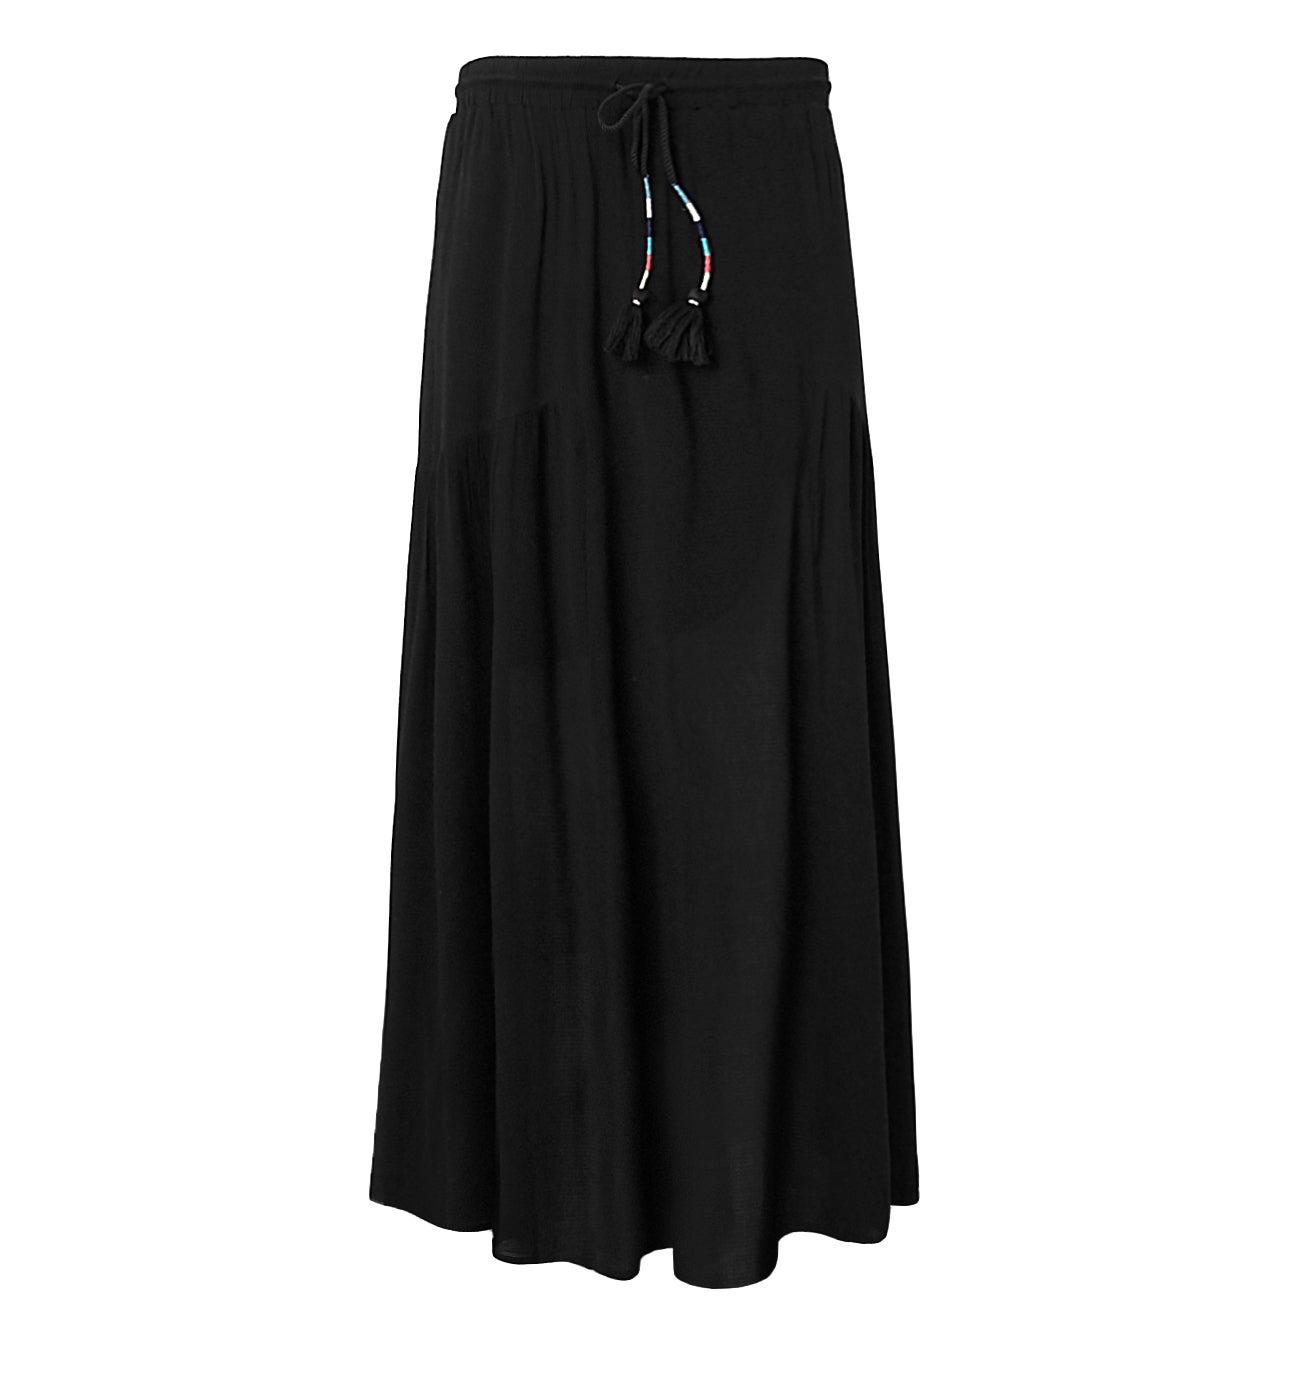 Longue jupe jupon Femme